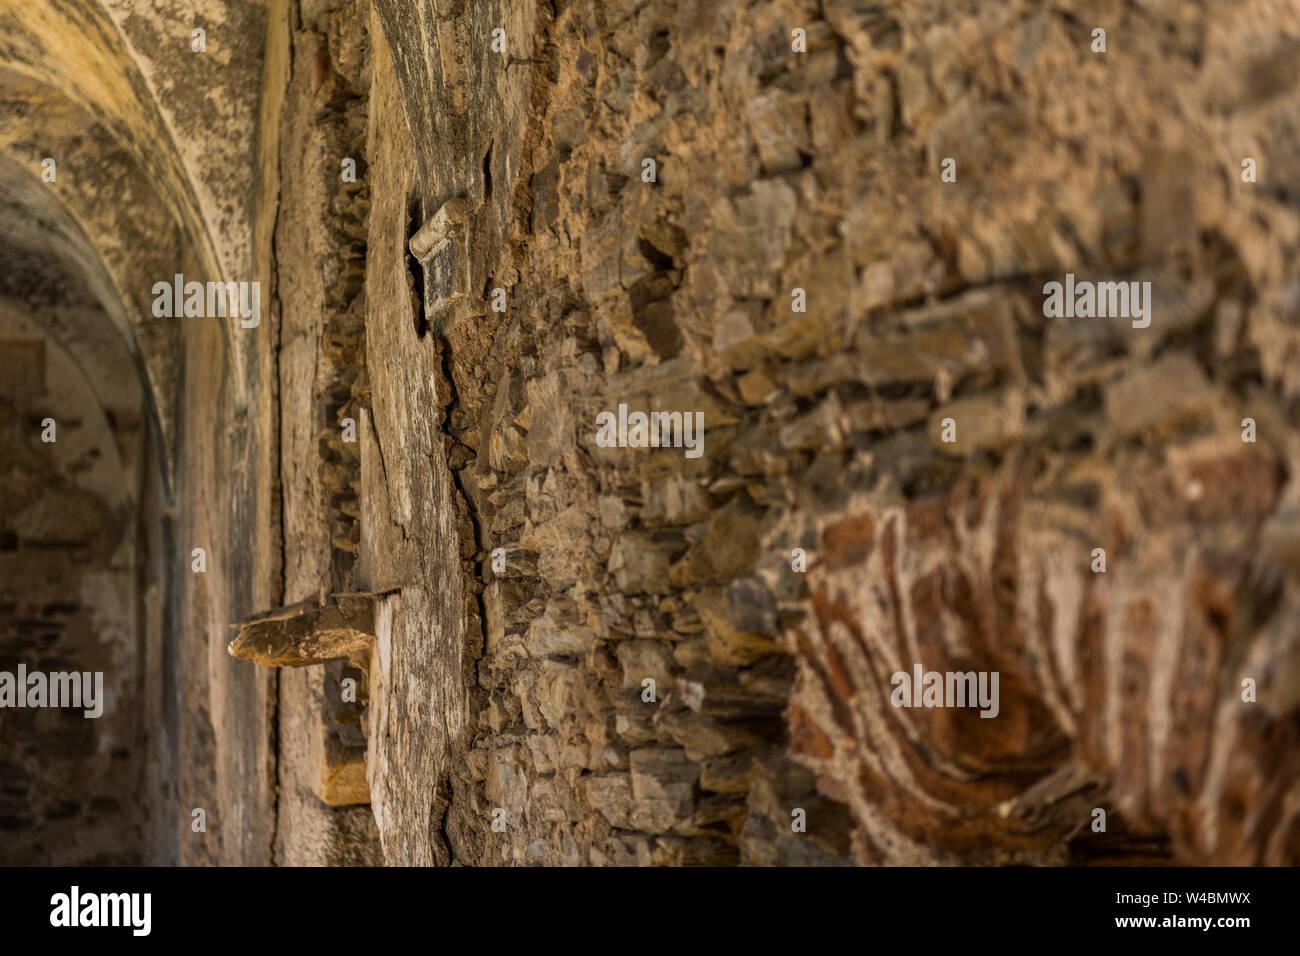 One of the walls of the cloister of the abandoned convent of San Antonio de Padua, Garrovillas de Alconetar Stock Photo